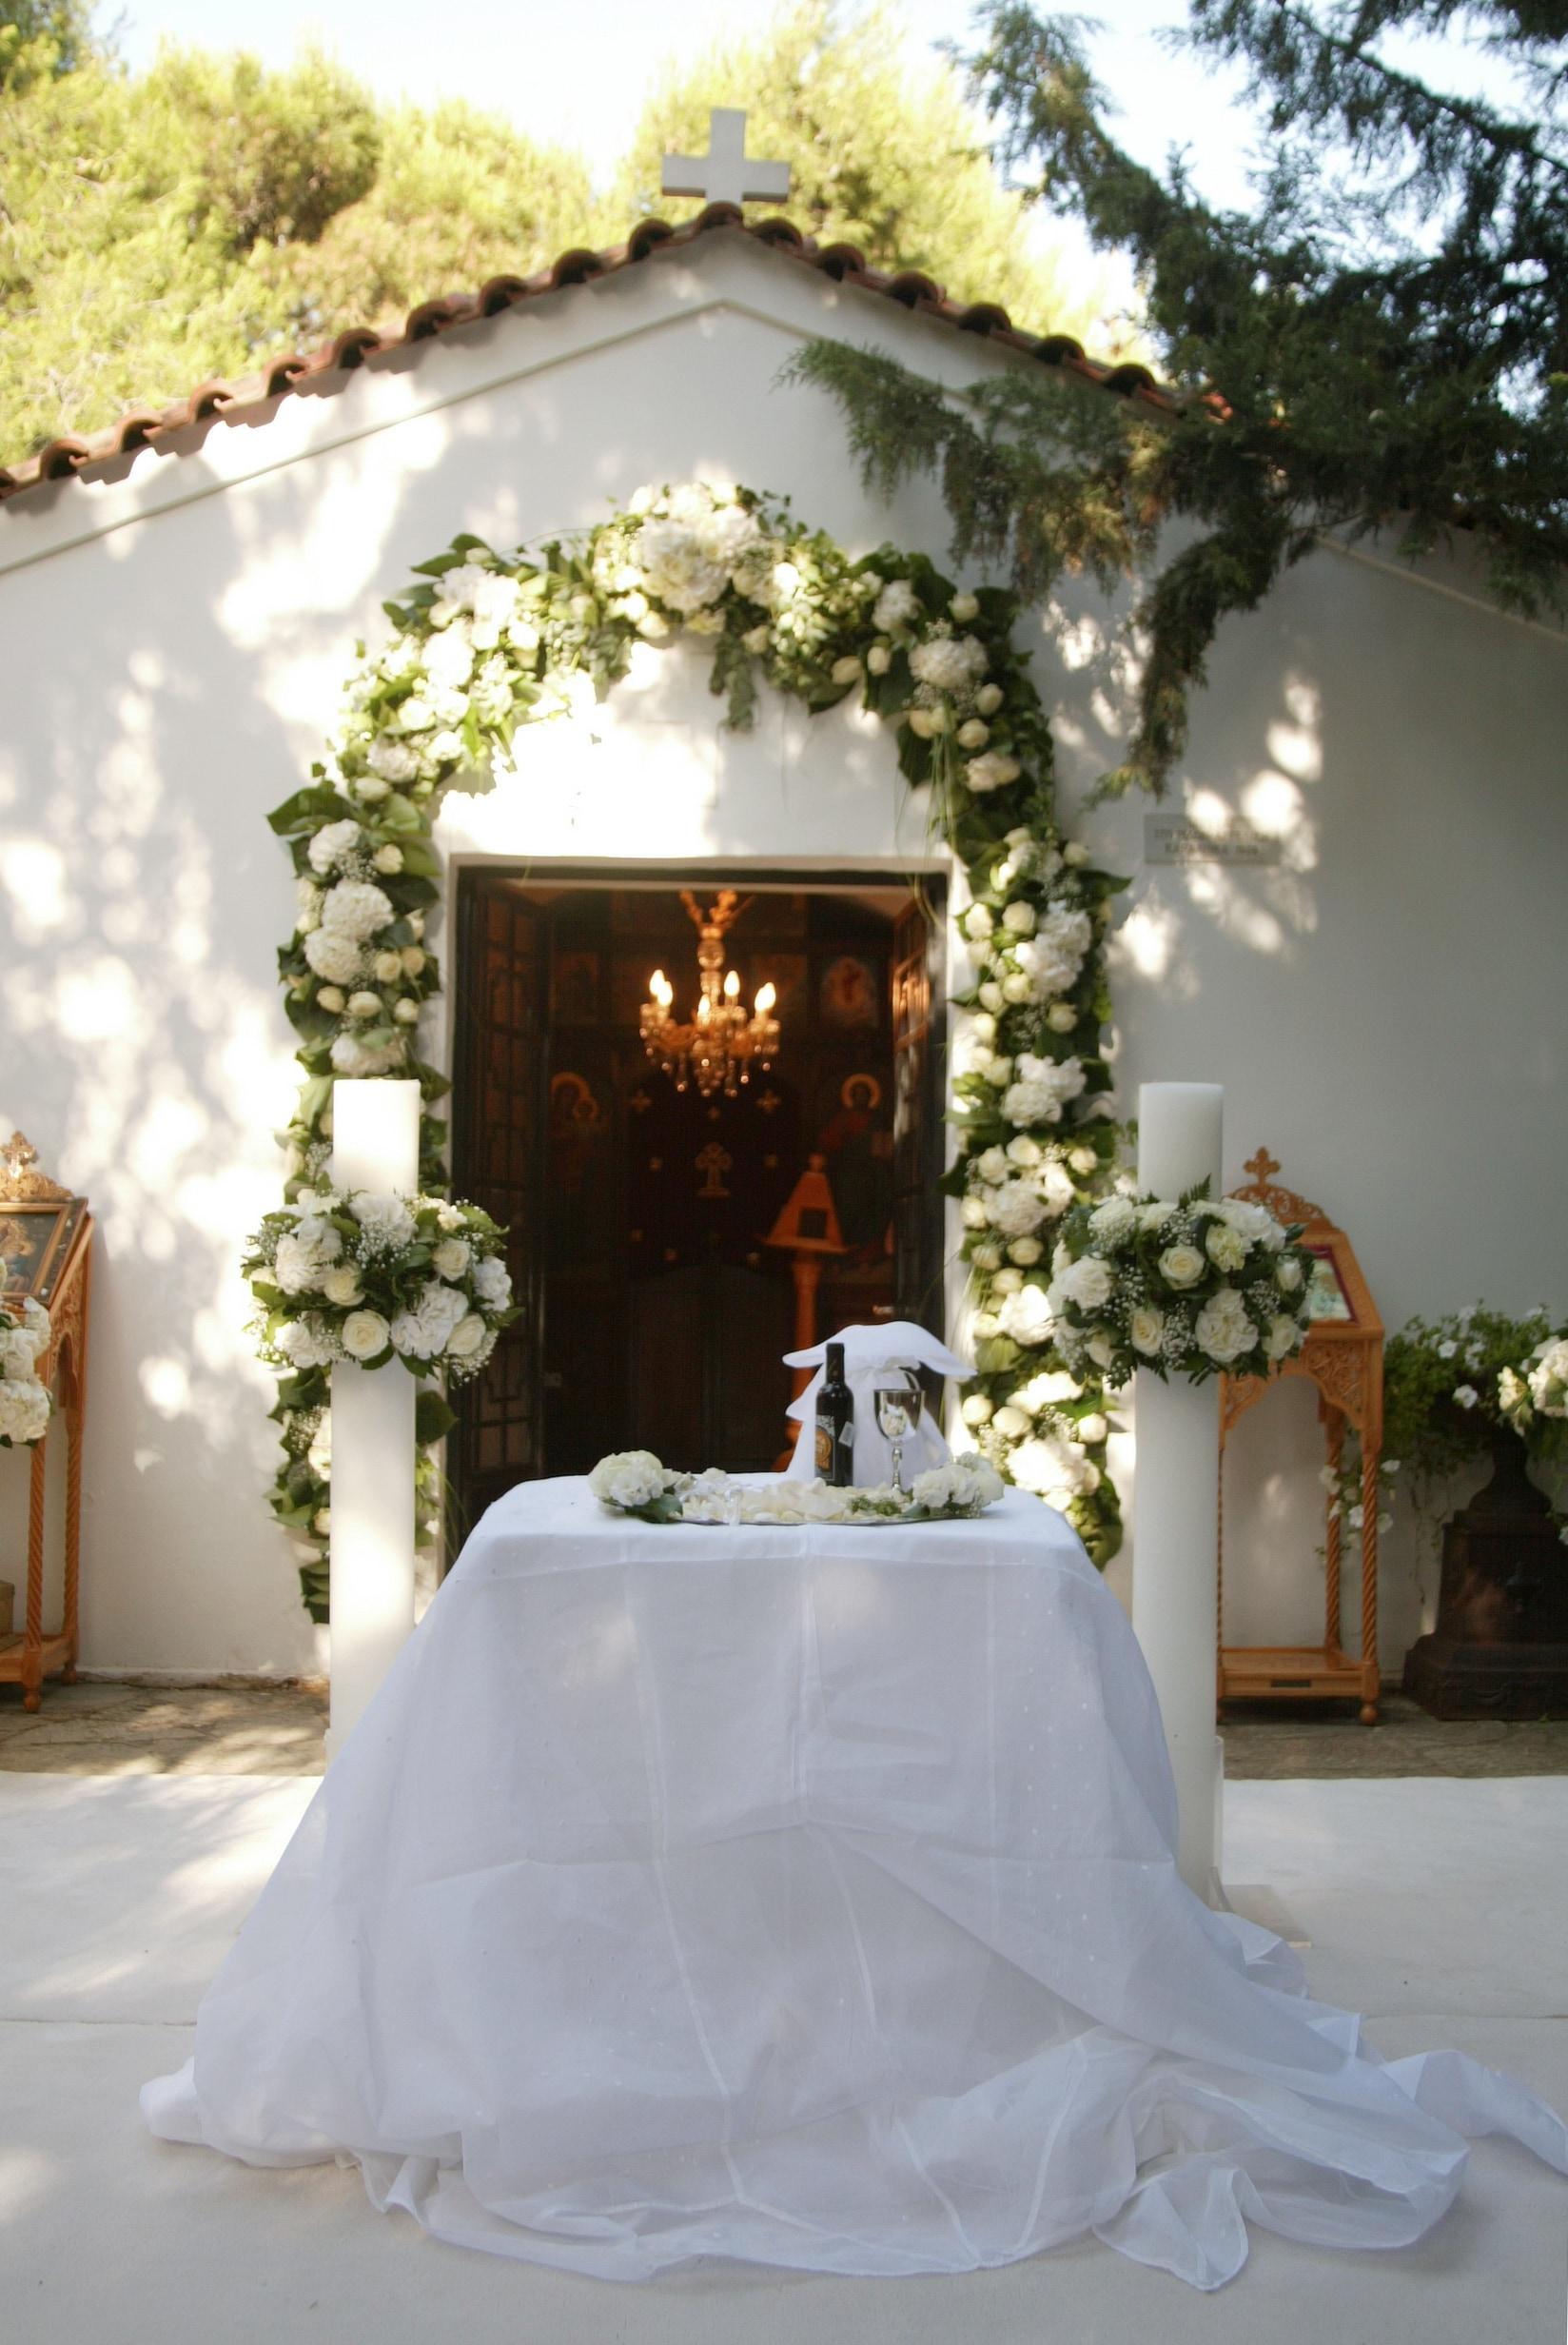 Avaton Luxury Villas Resort Wedding Planners Destination Weddings Abroad Vow Renewals Marriages WeddingsAbroad.com